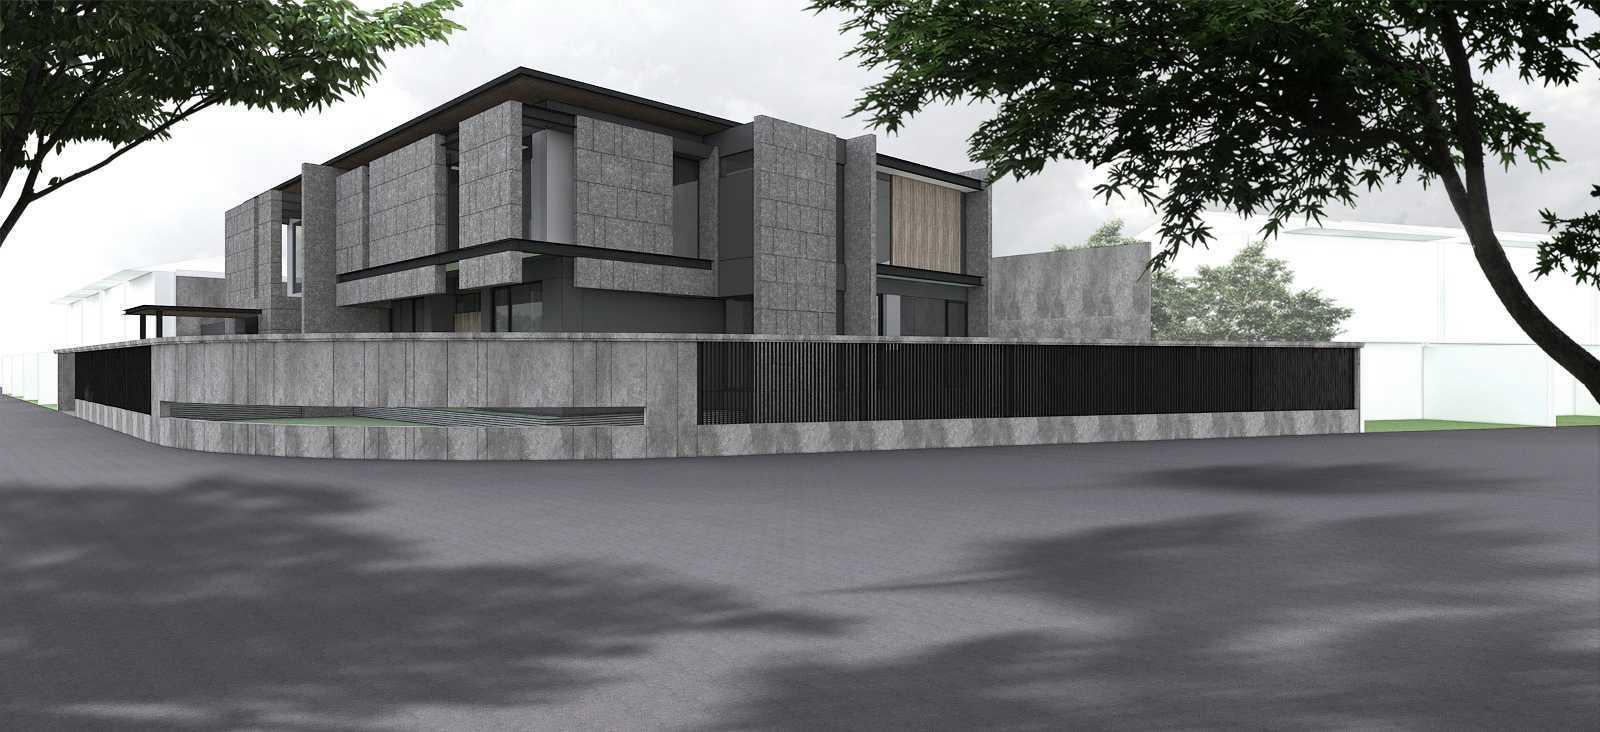 Q Studio An House Depok, Kota Depok, Jawa Barat, Indonesia Depok, Kota Depok, Jawa Barat, Indonesia Q-Studio-An-House  68763